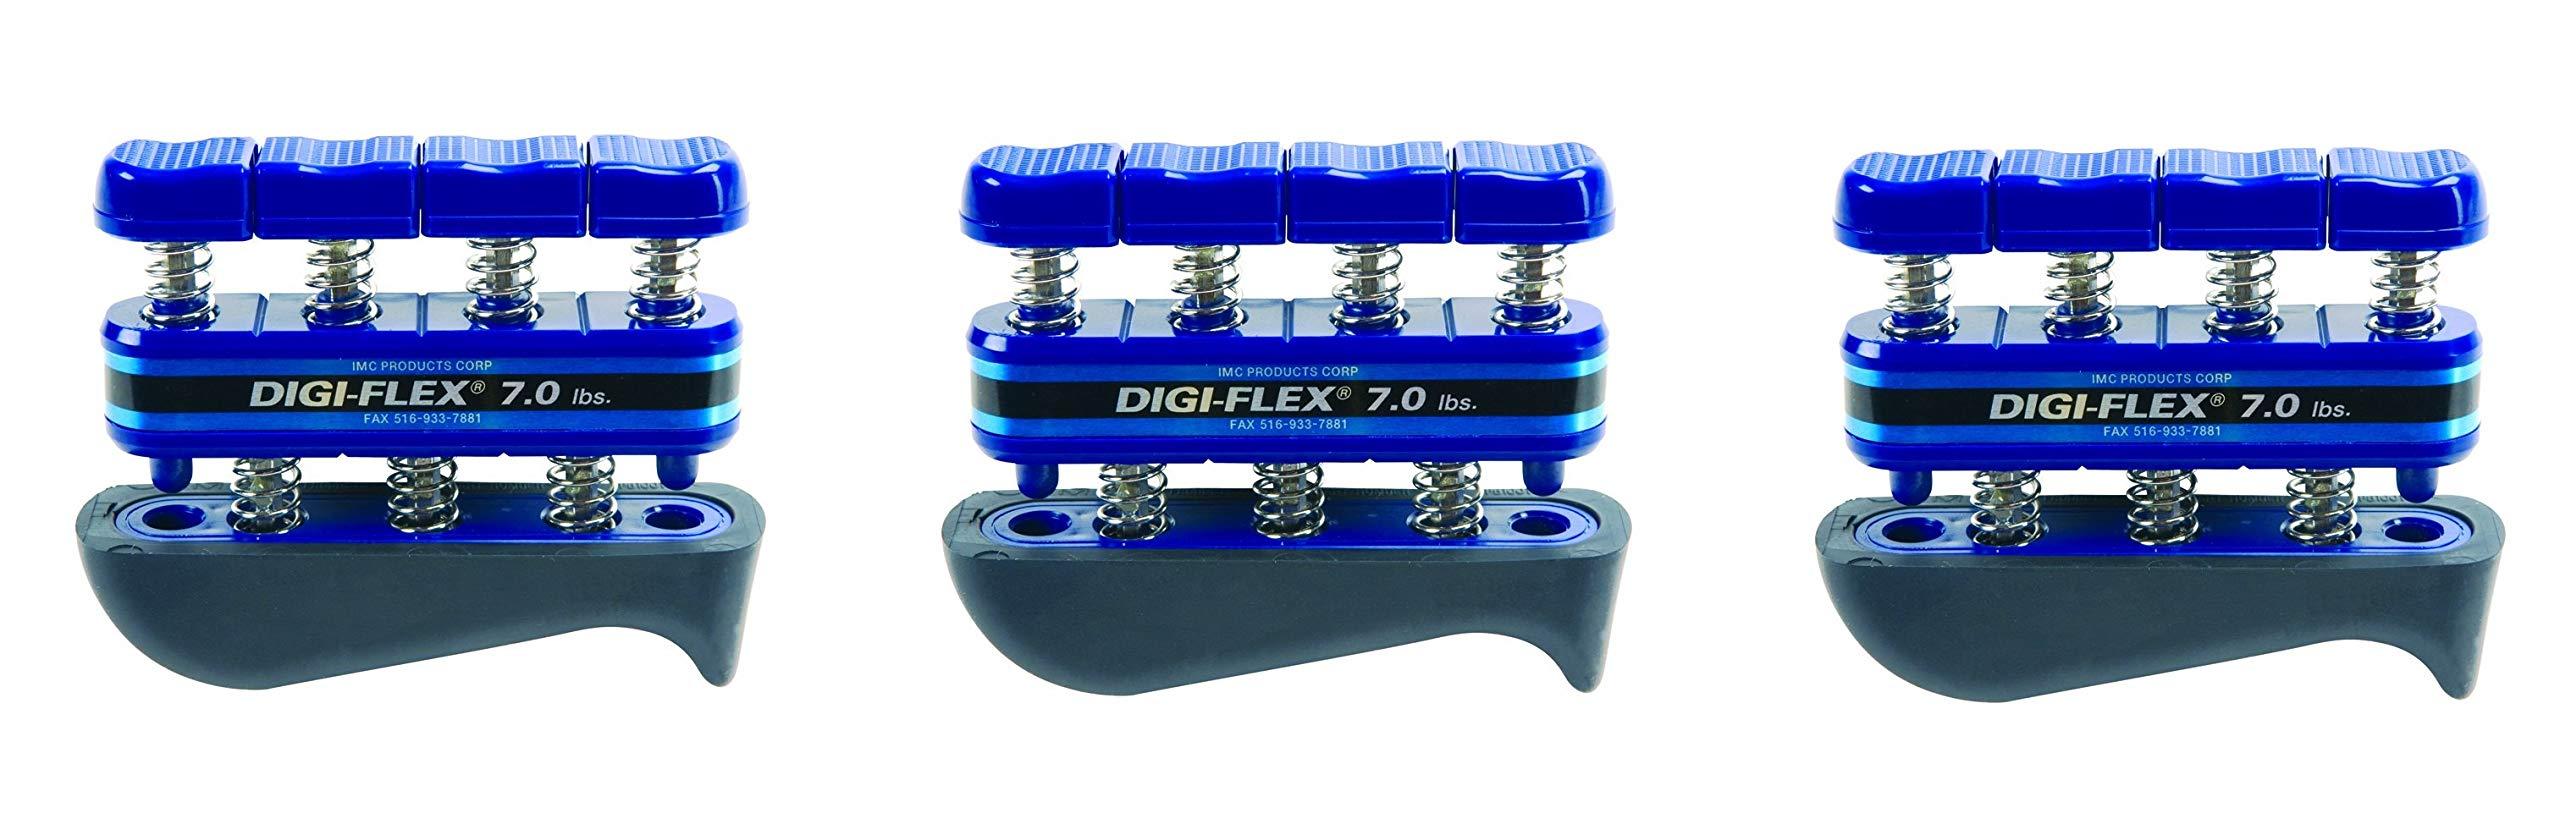 Digi-Flex Blue Hand and Finger Exercise System, 7 lbs Resistance (3-Pack)